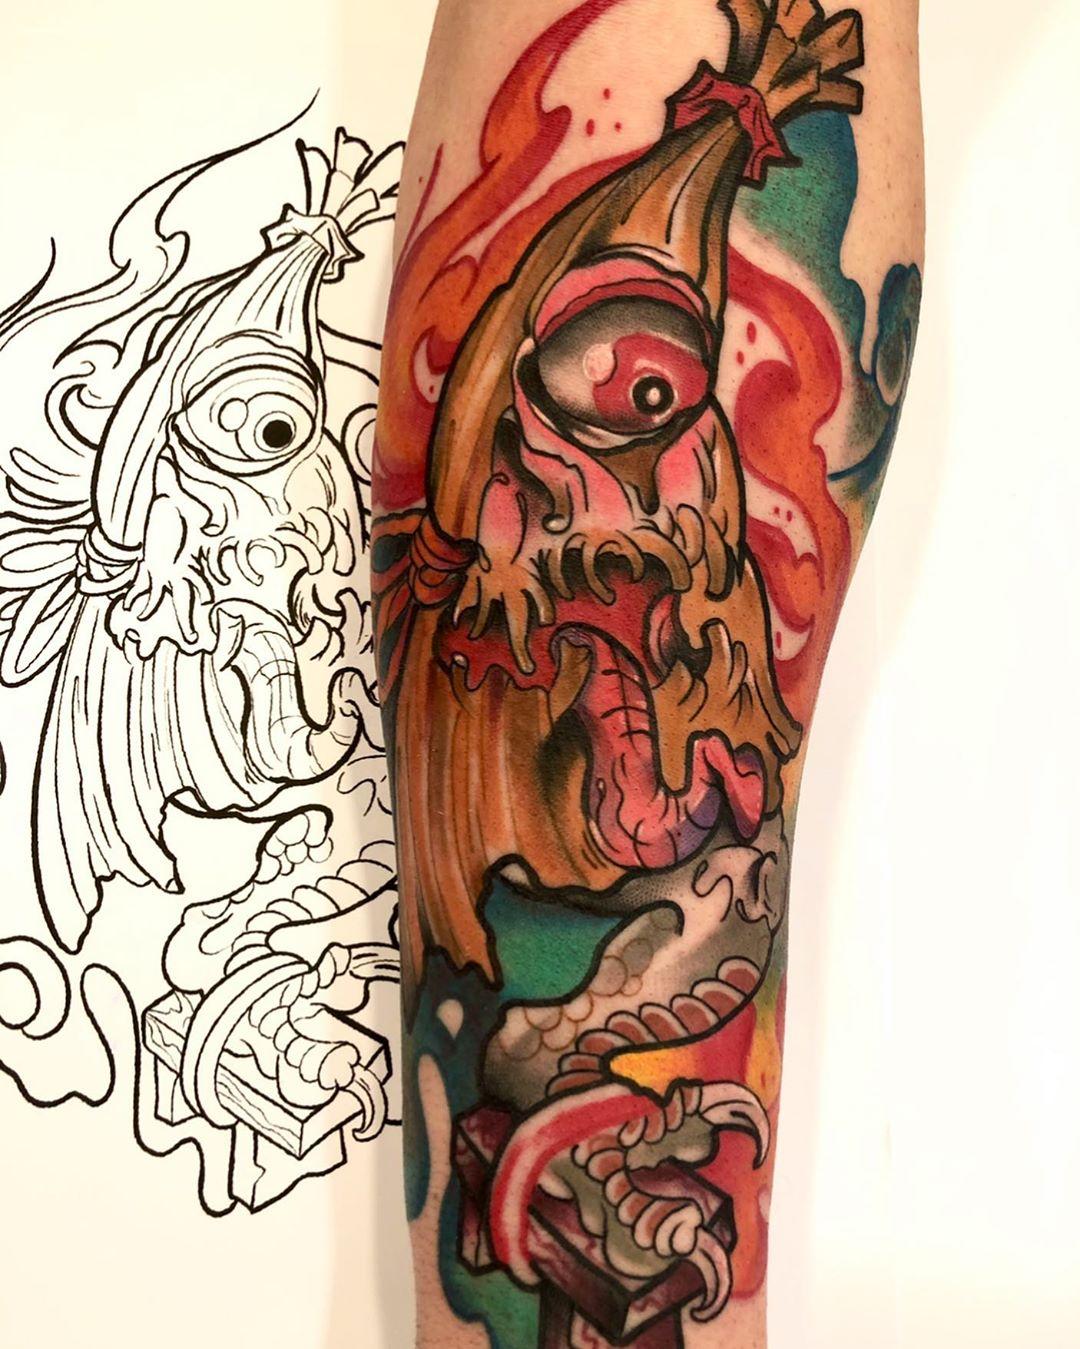 japanesetattoo,followforfollow,berlin,followmeciudadreal,ciudadreal,tomelloso,almagro,puertollano,tatuajesenpuertollano,tatuajesendaimiel,ciudadrealtattoo,ciudadrealtatuajes,tatuajesciudadreal,follow,ciudadrealtatuajes,puertollano,tattooers,besttattooers,juantabasco,ciudadrealsetatua,ink,tatuajes,realiismo,realistictattoo,ciudadrealtattoo,tatuajesenpuertollano,traditionaltattoos,castillalamancha,ink,tattooart,zurichtattoo,daimiel,inkedgirls,inkig,ink,inktattoosjub